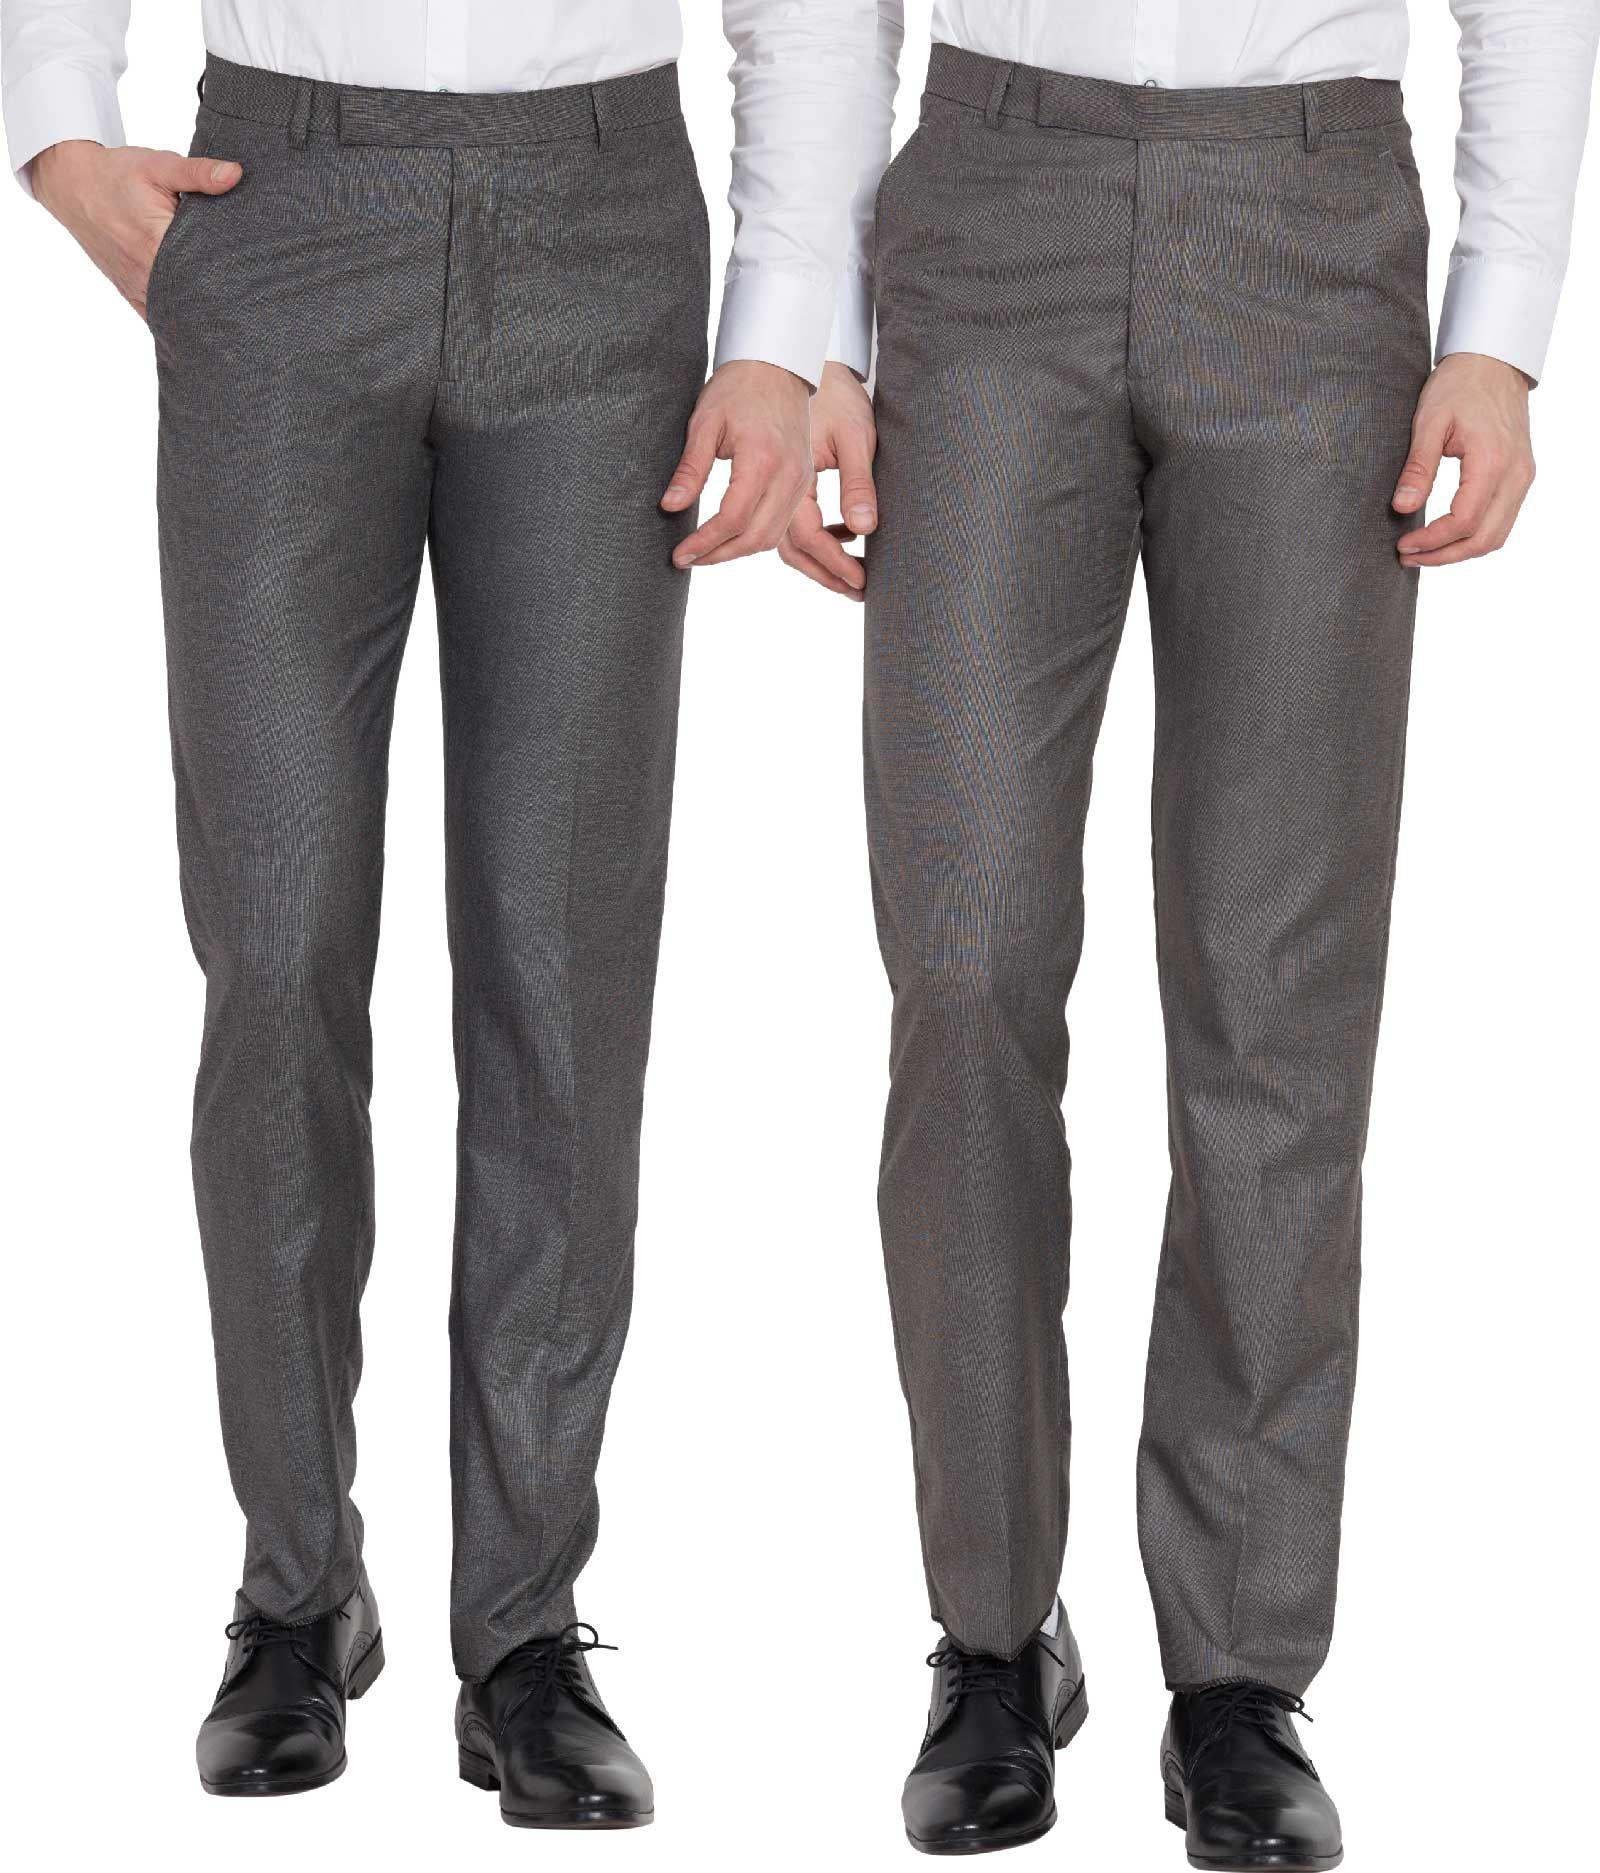 Haoser Multi Slim -Fit Flat Trousers